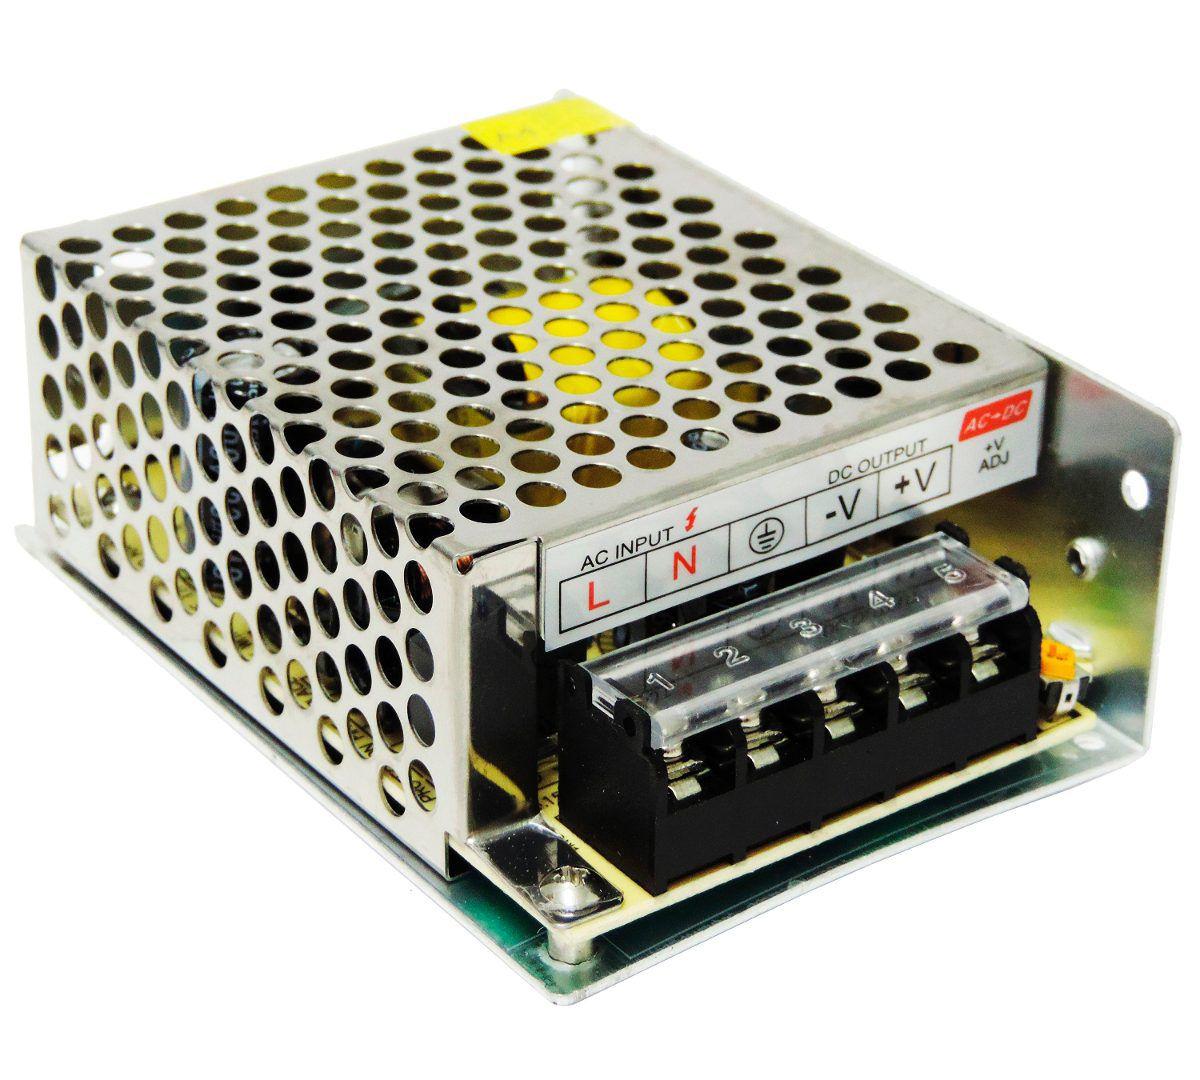 Fonte Chaveada Bivolt Tipo Colmeia 12v X 10a Para Cftv  - Mega Computadores